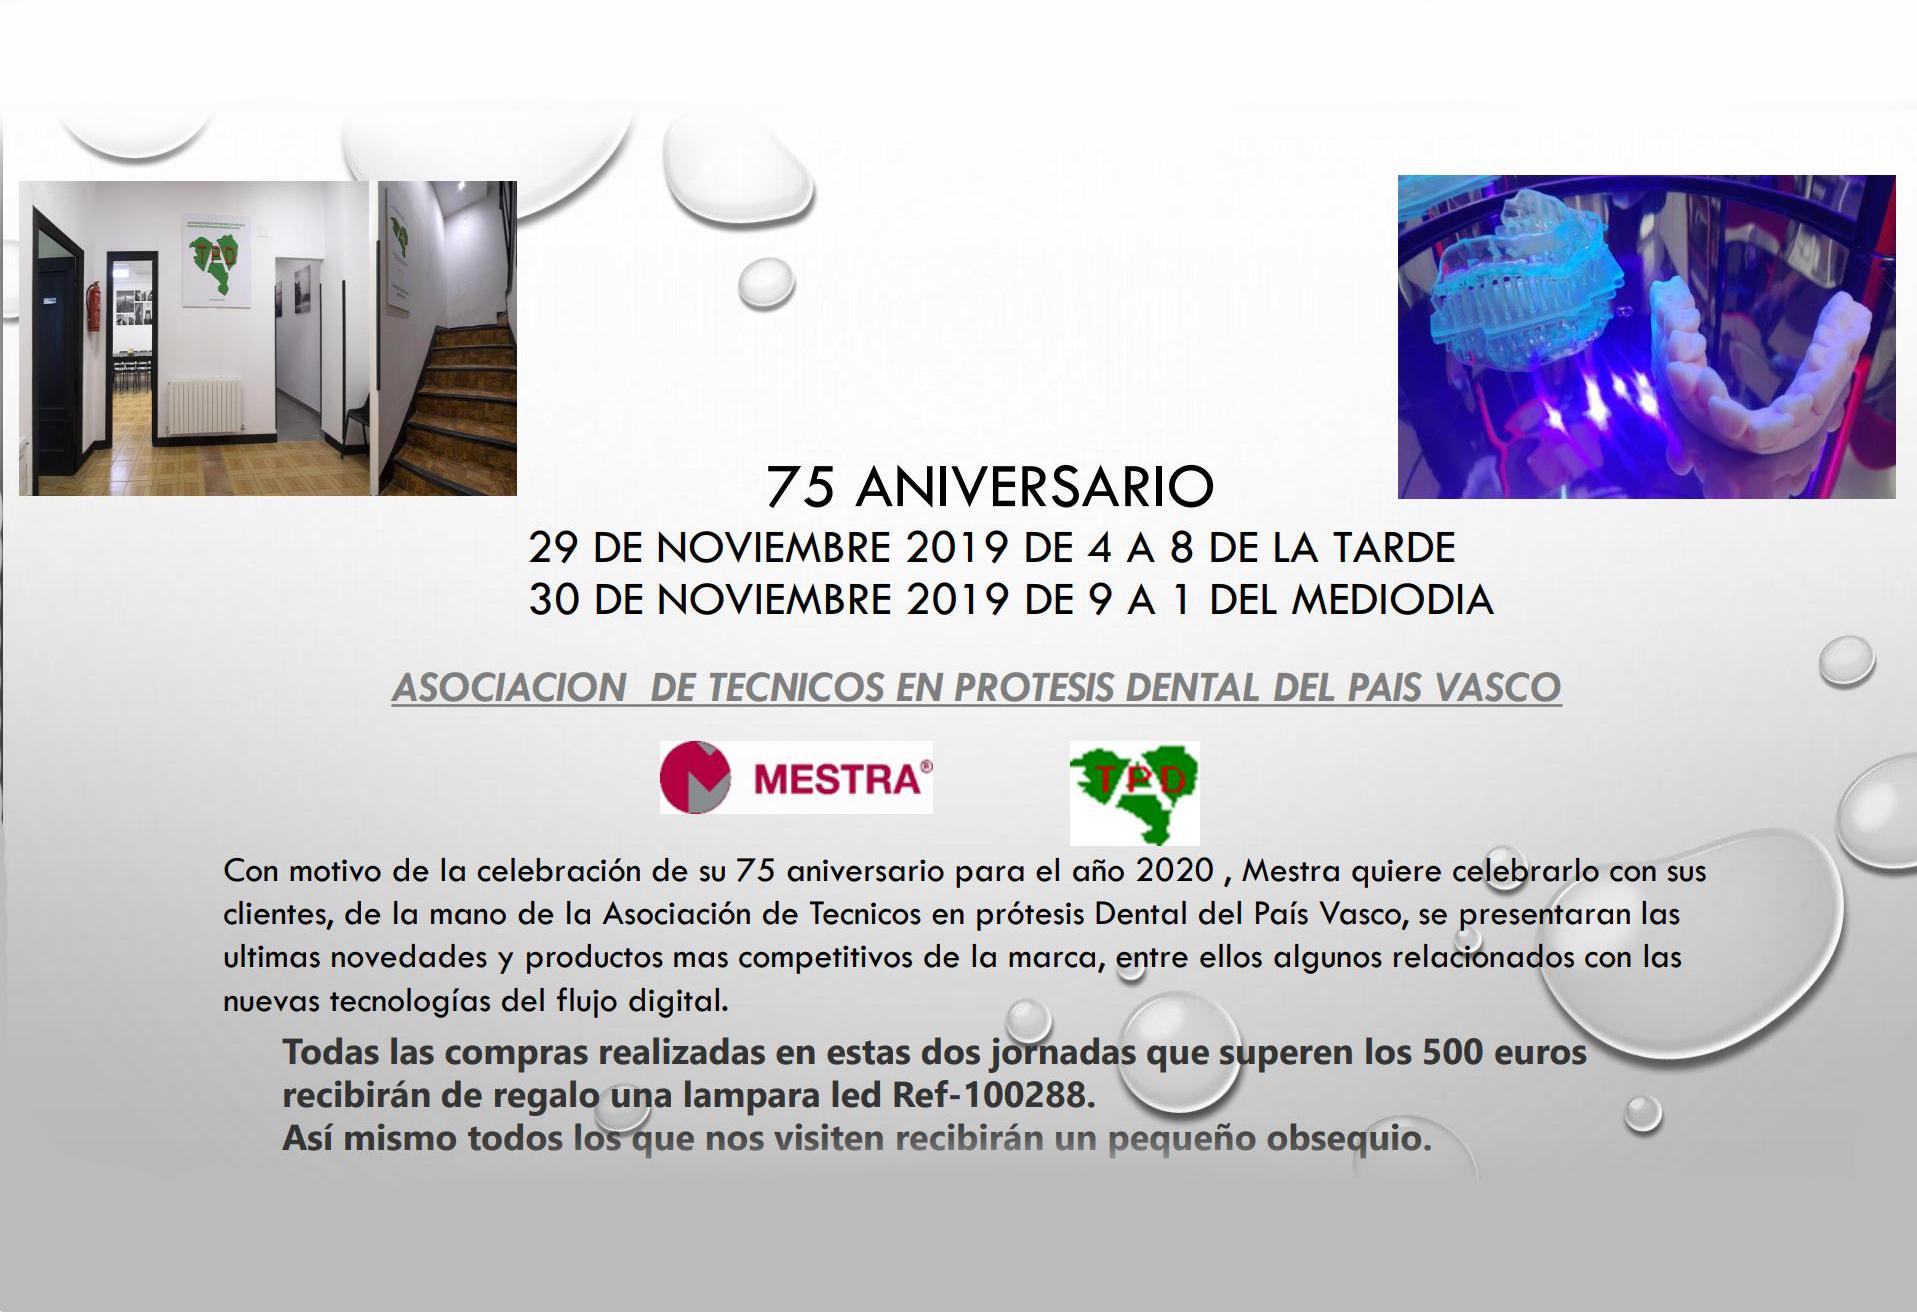 75 Aniversario MESTRA